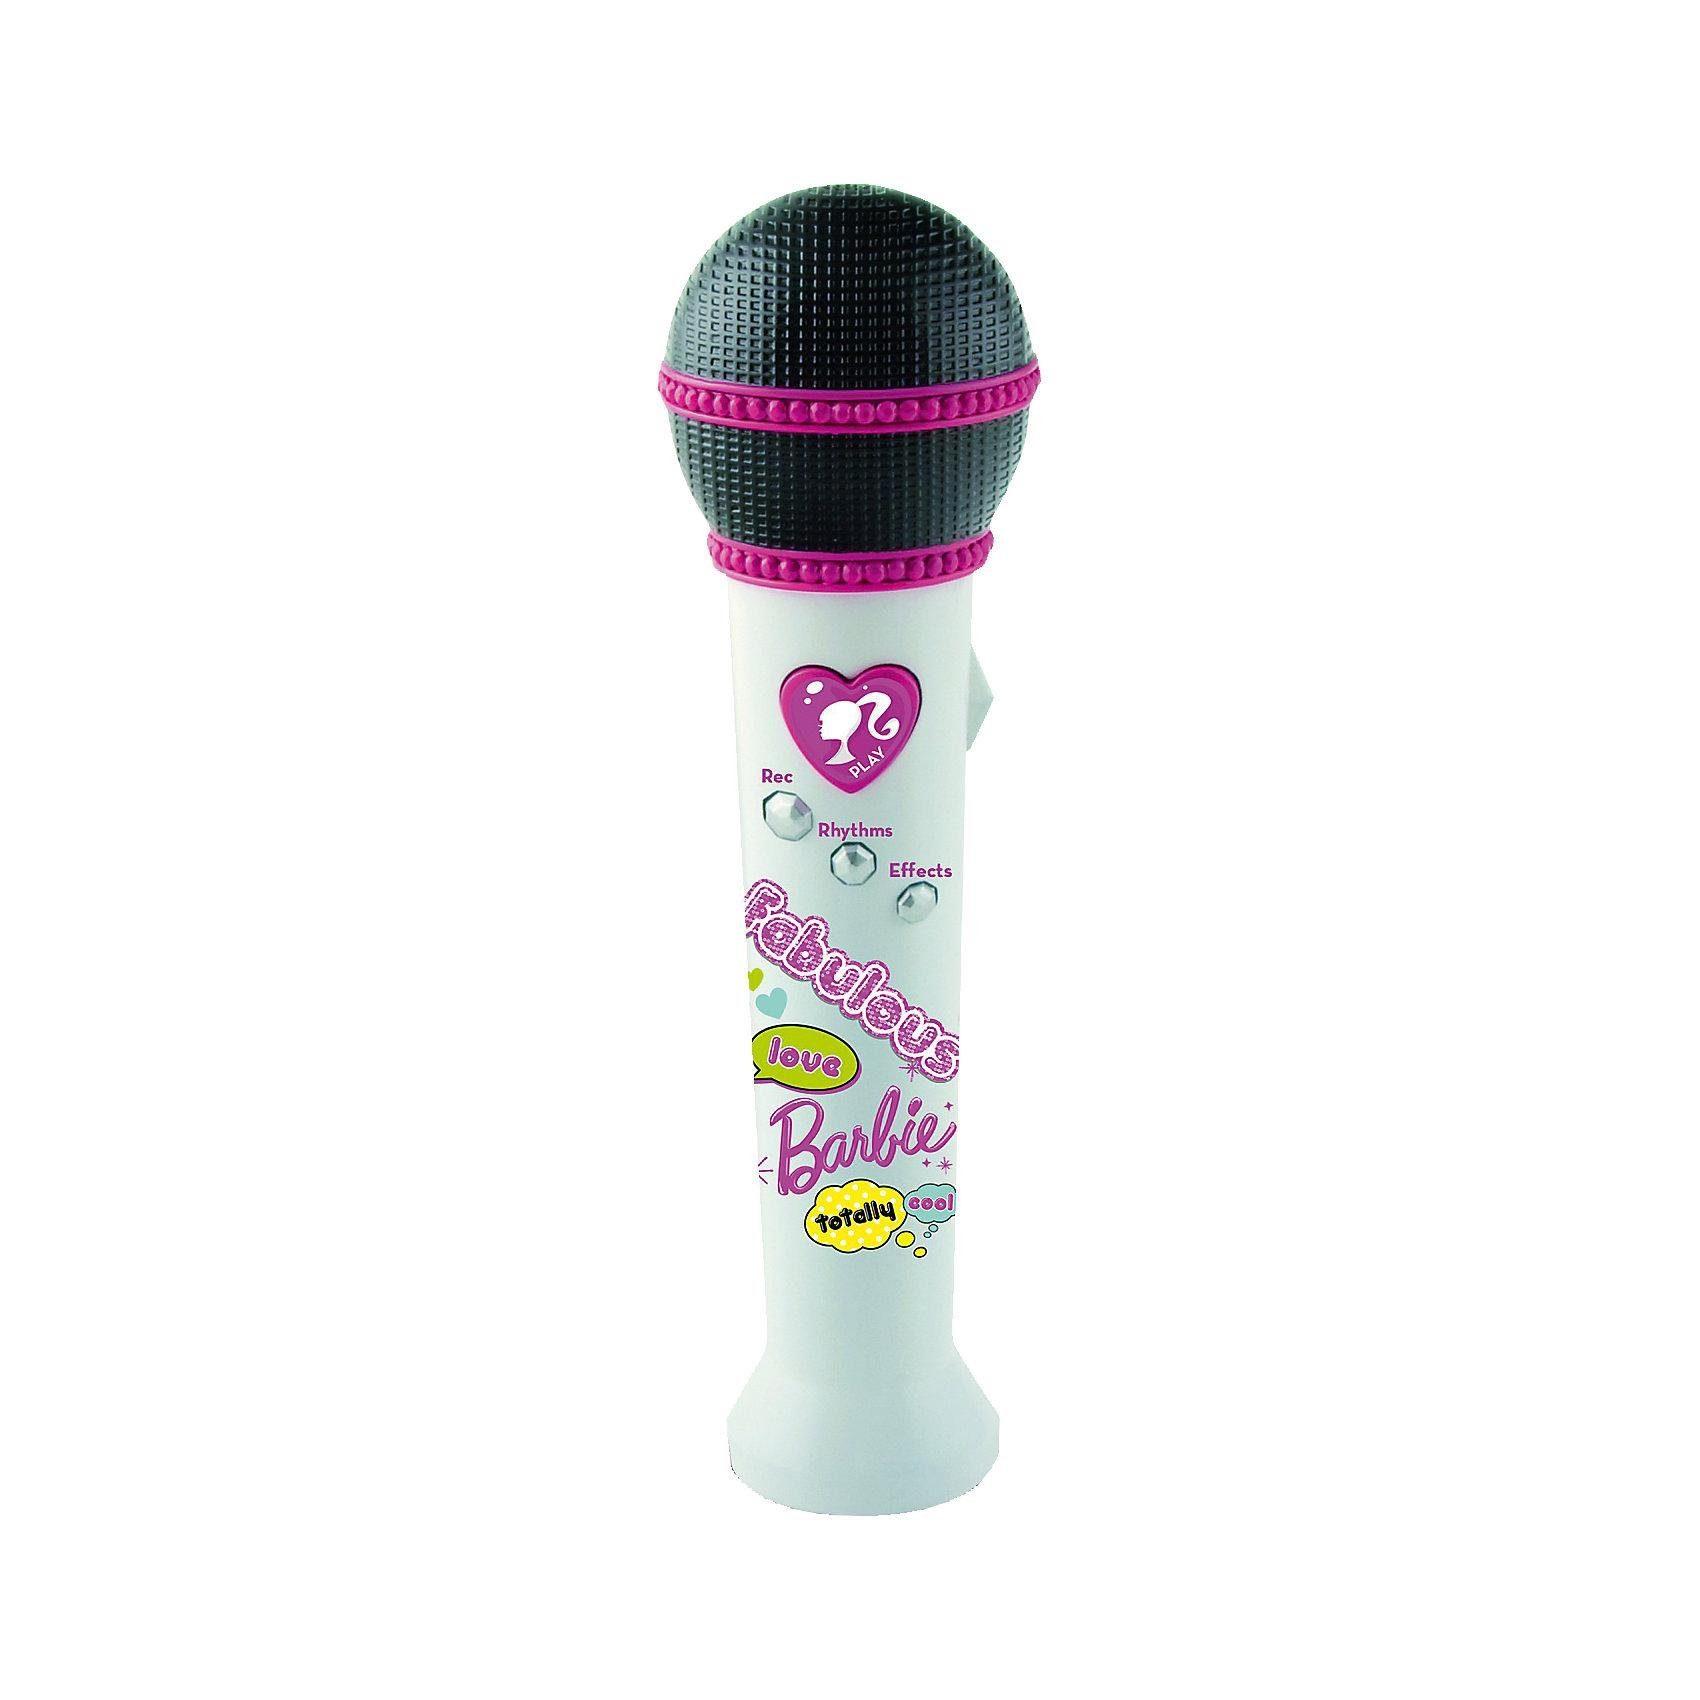 IMC Toys Barbie Mikrofon mit Aufnahmefunktion